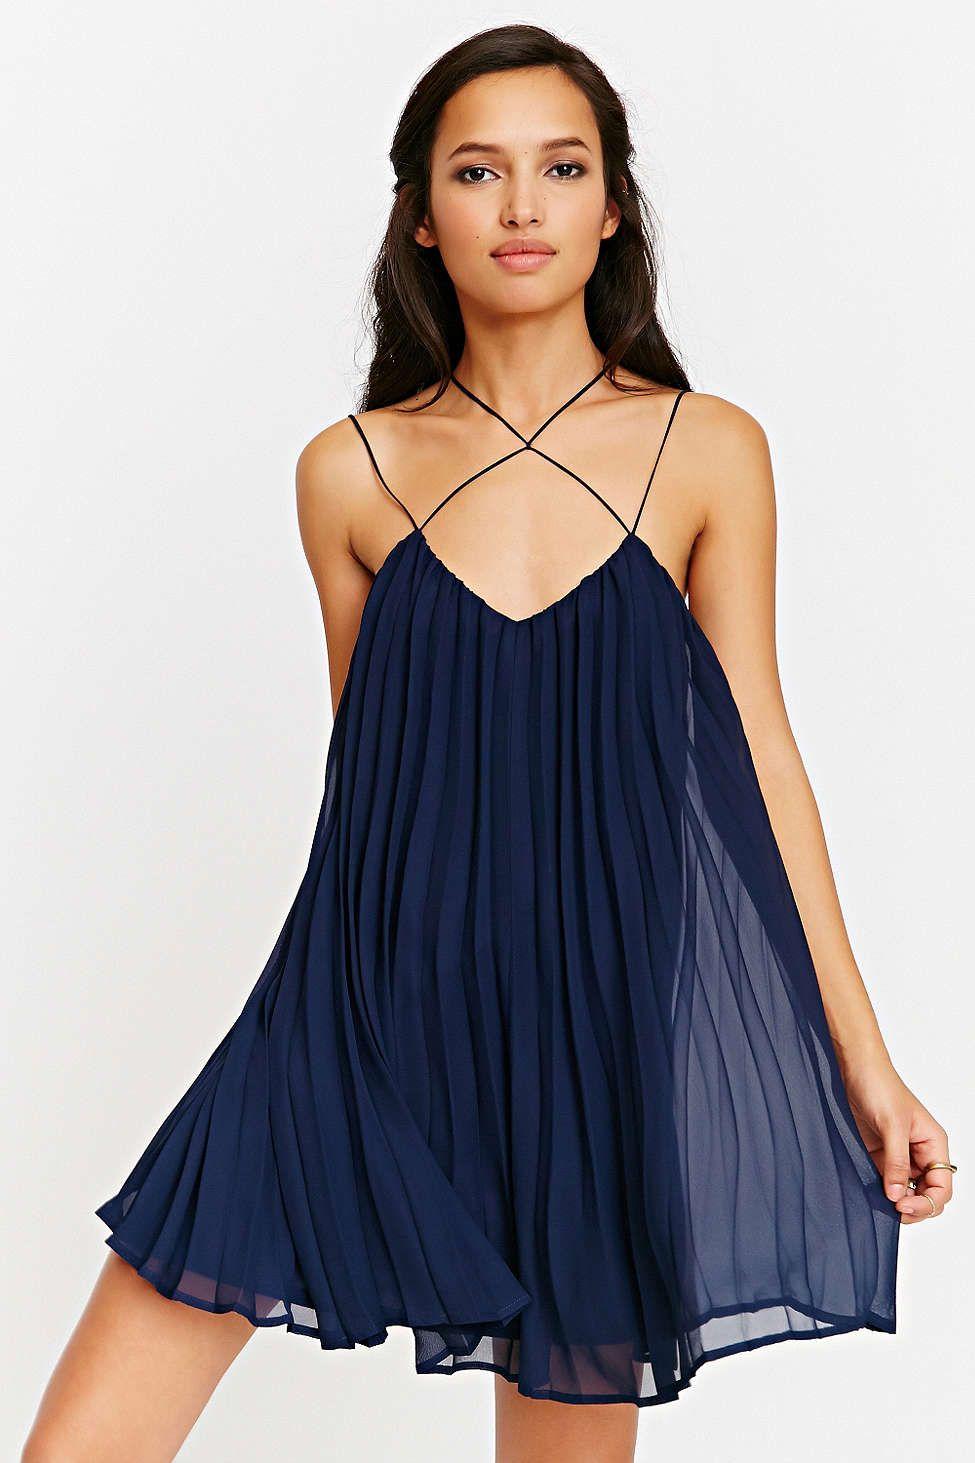 Sheer Spaghetti Strap Dresses